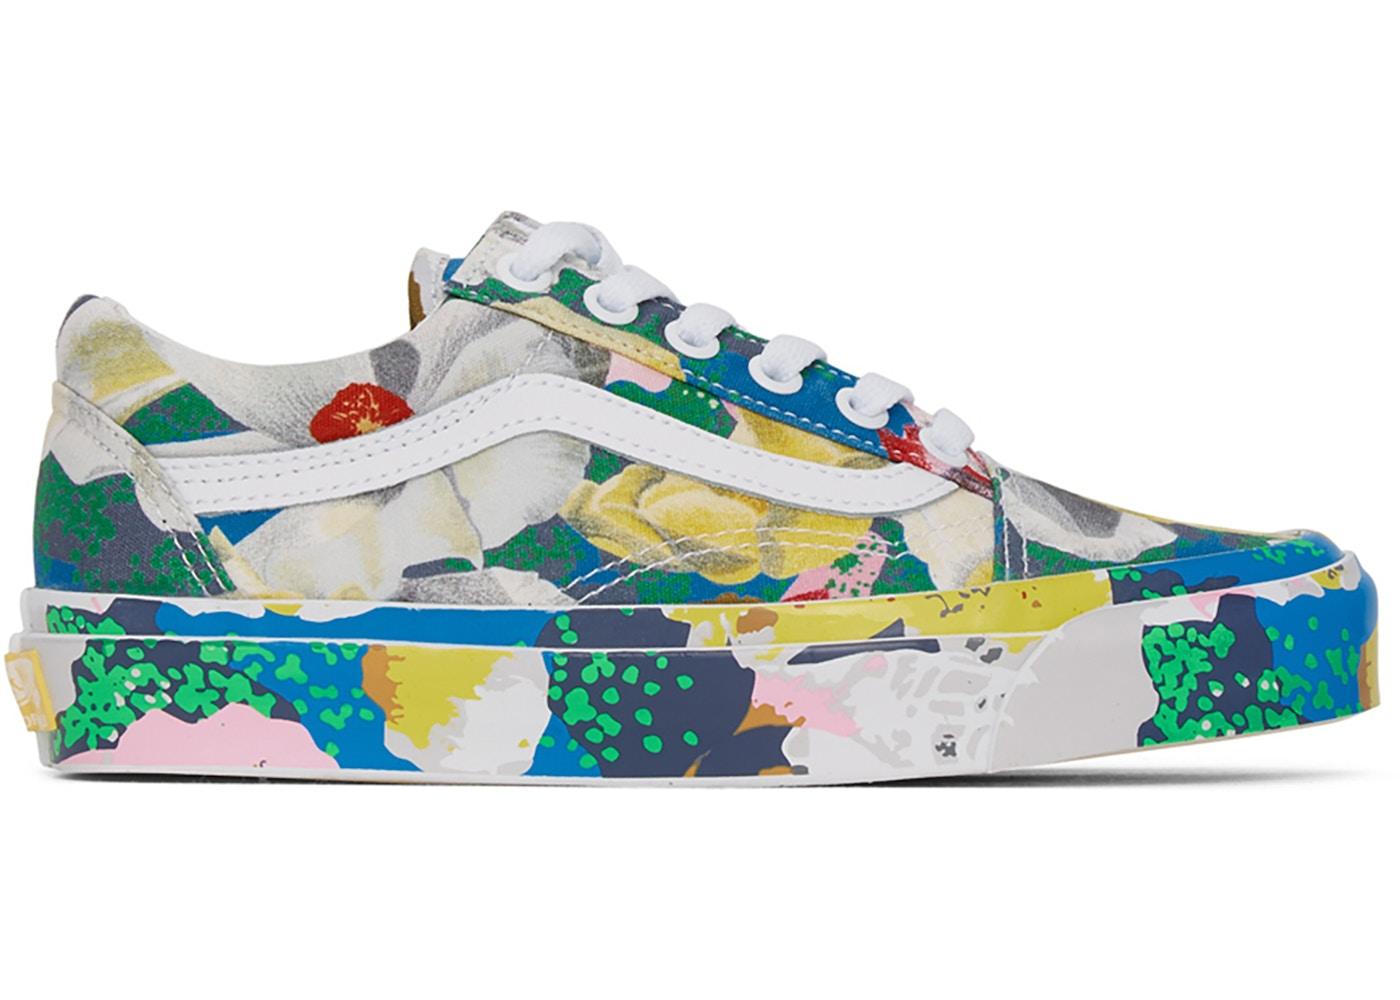 Vans Shoes Release Date